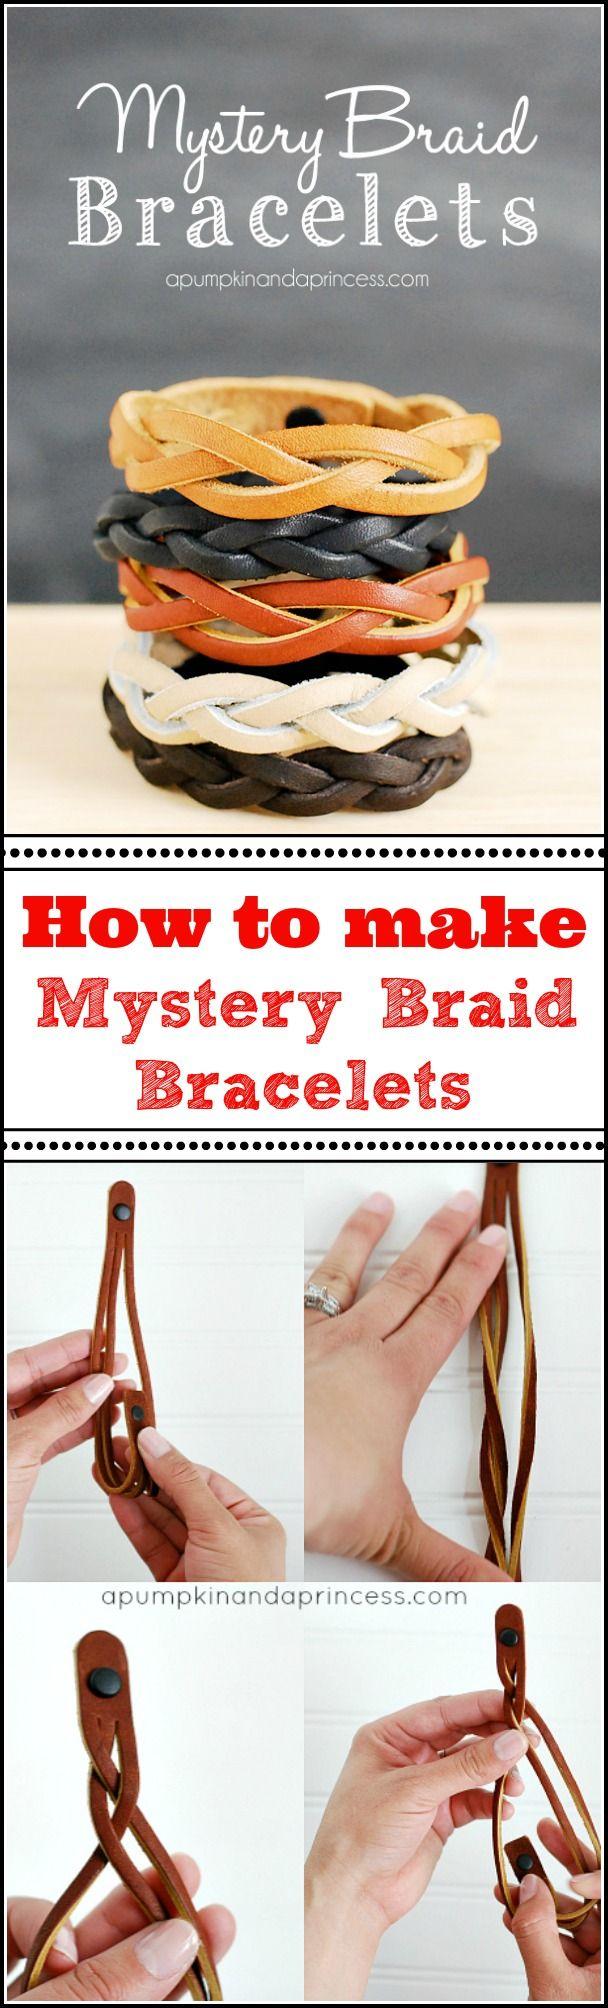 How to make a Mystery Braid Bracelet - A Pumpkin And A Princess